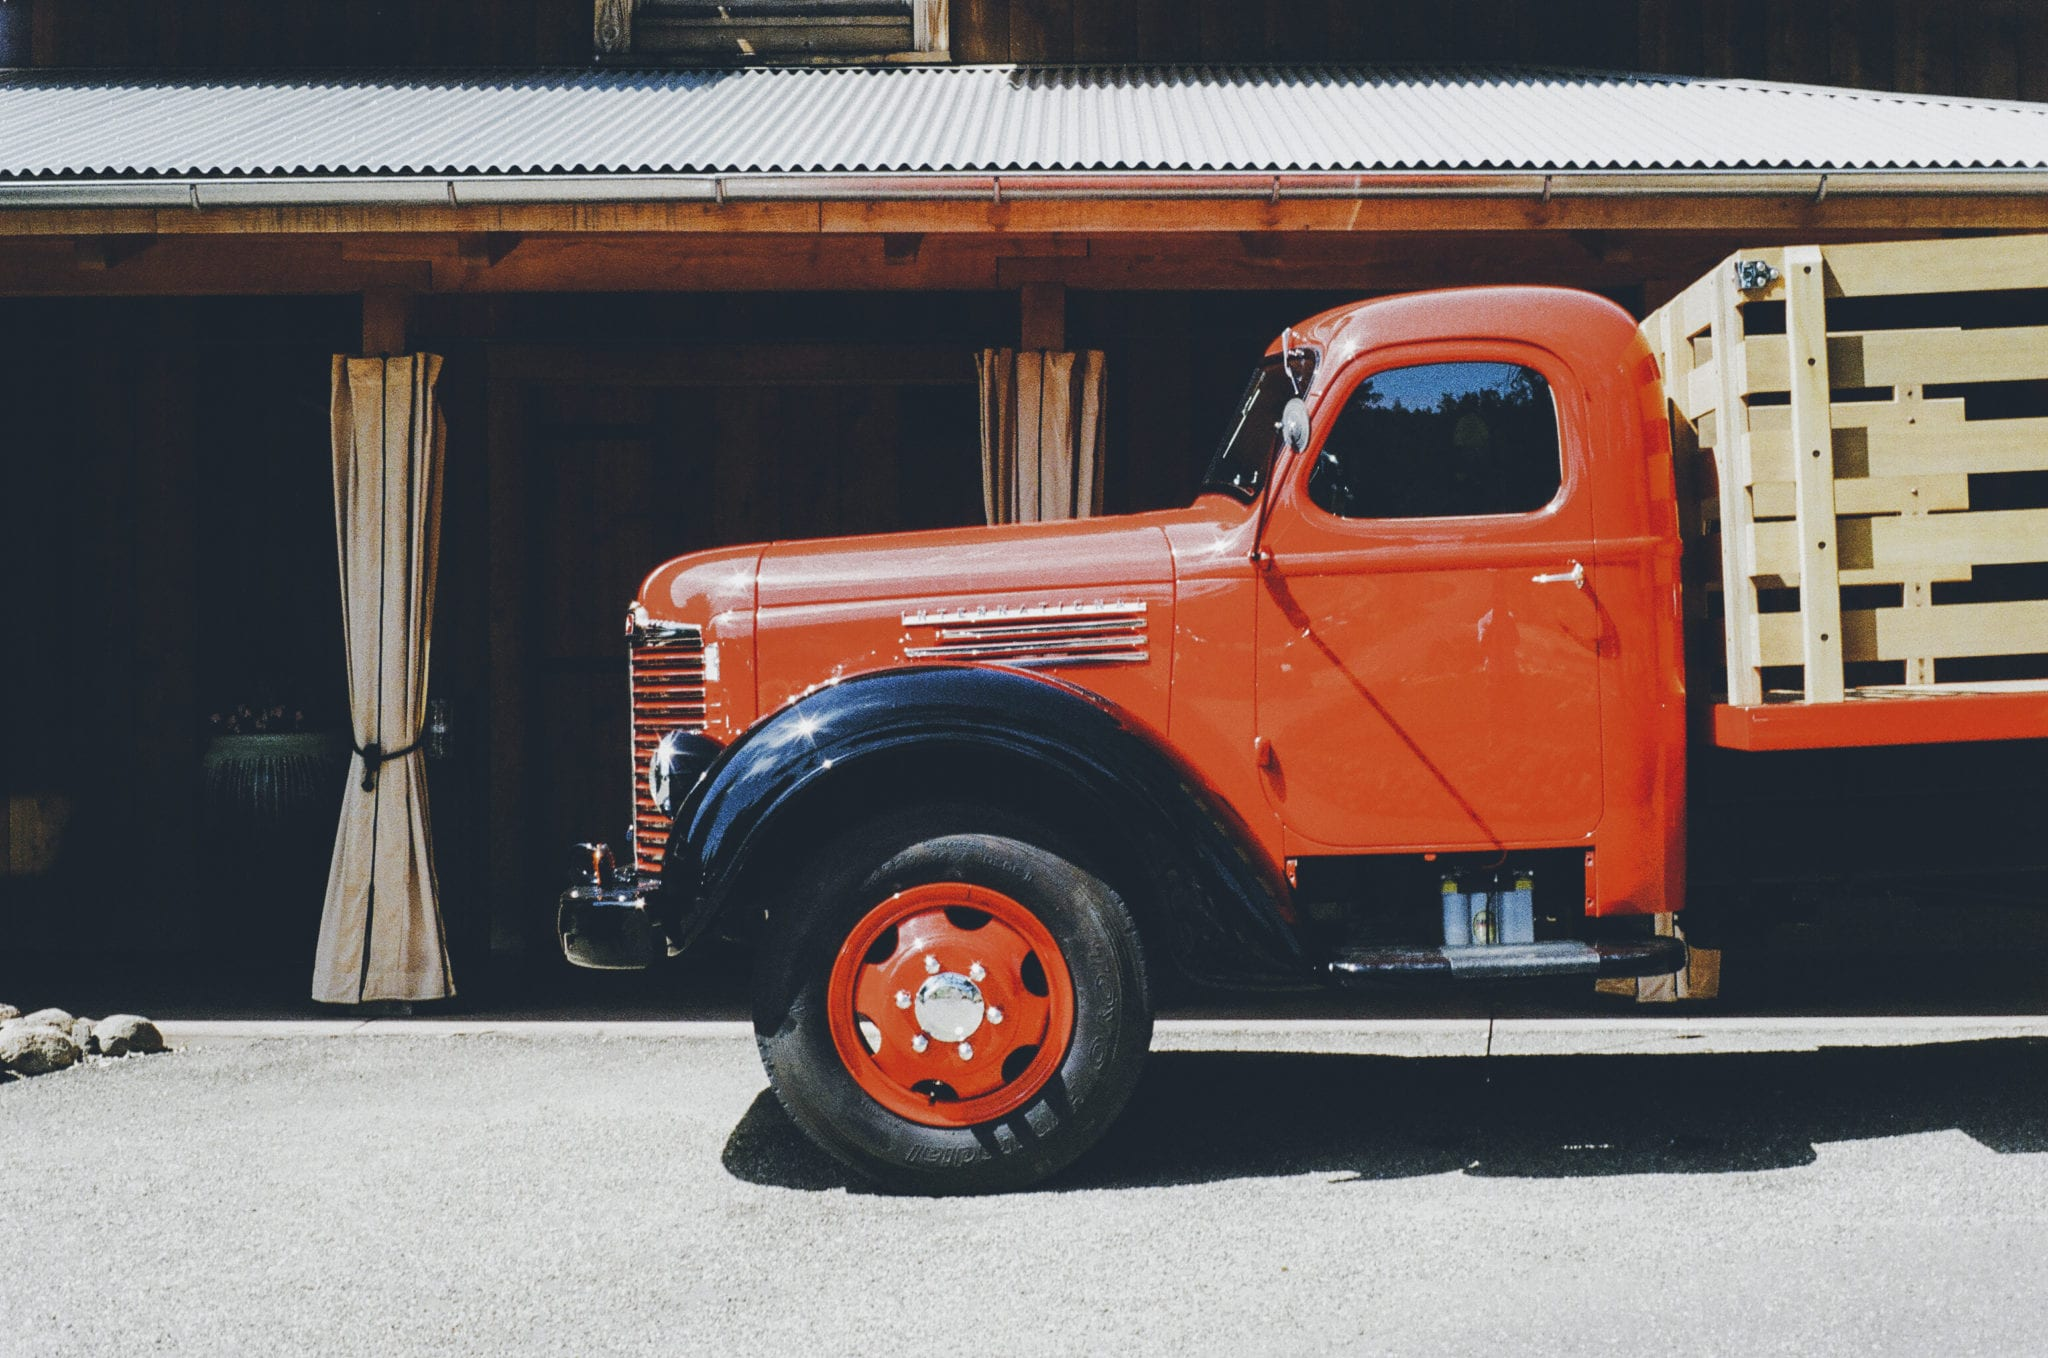 Labeled for reuse: https://static.pexels.com/photos/2832/vehicle-vintage-old-truck.jpg